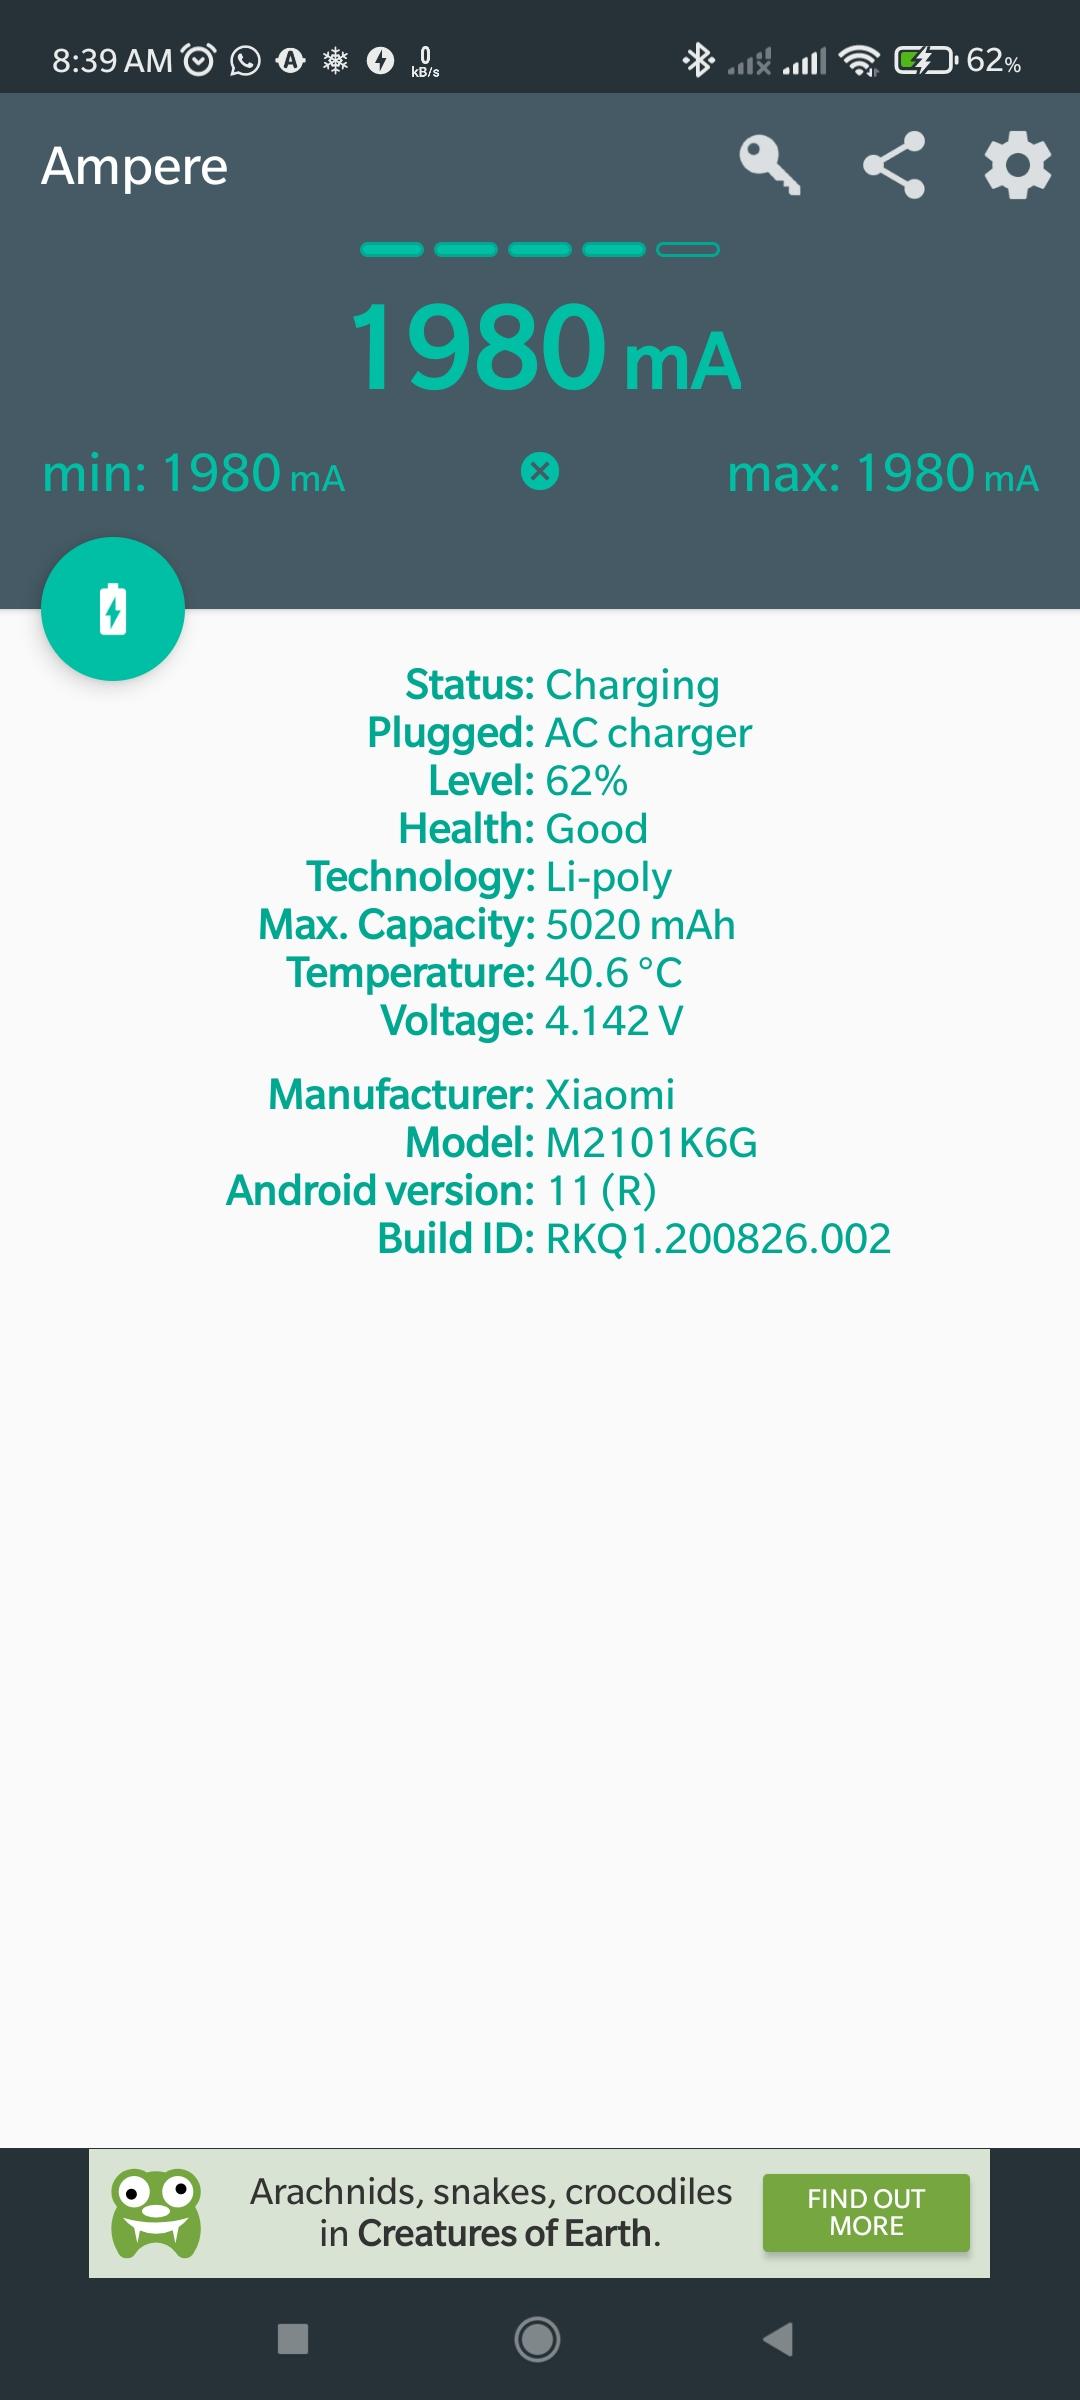 Screenshot_2021-08-19-08-39-39-135_com.gombosdev.ampere.jpg